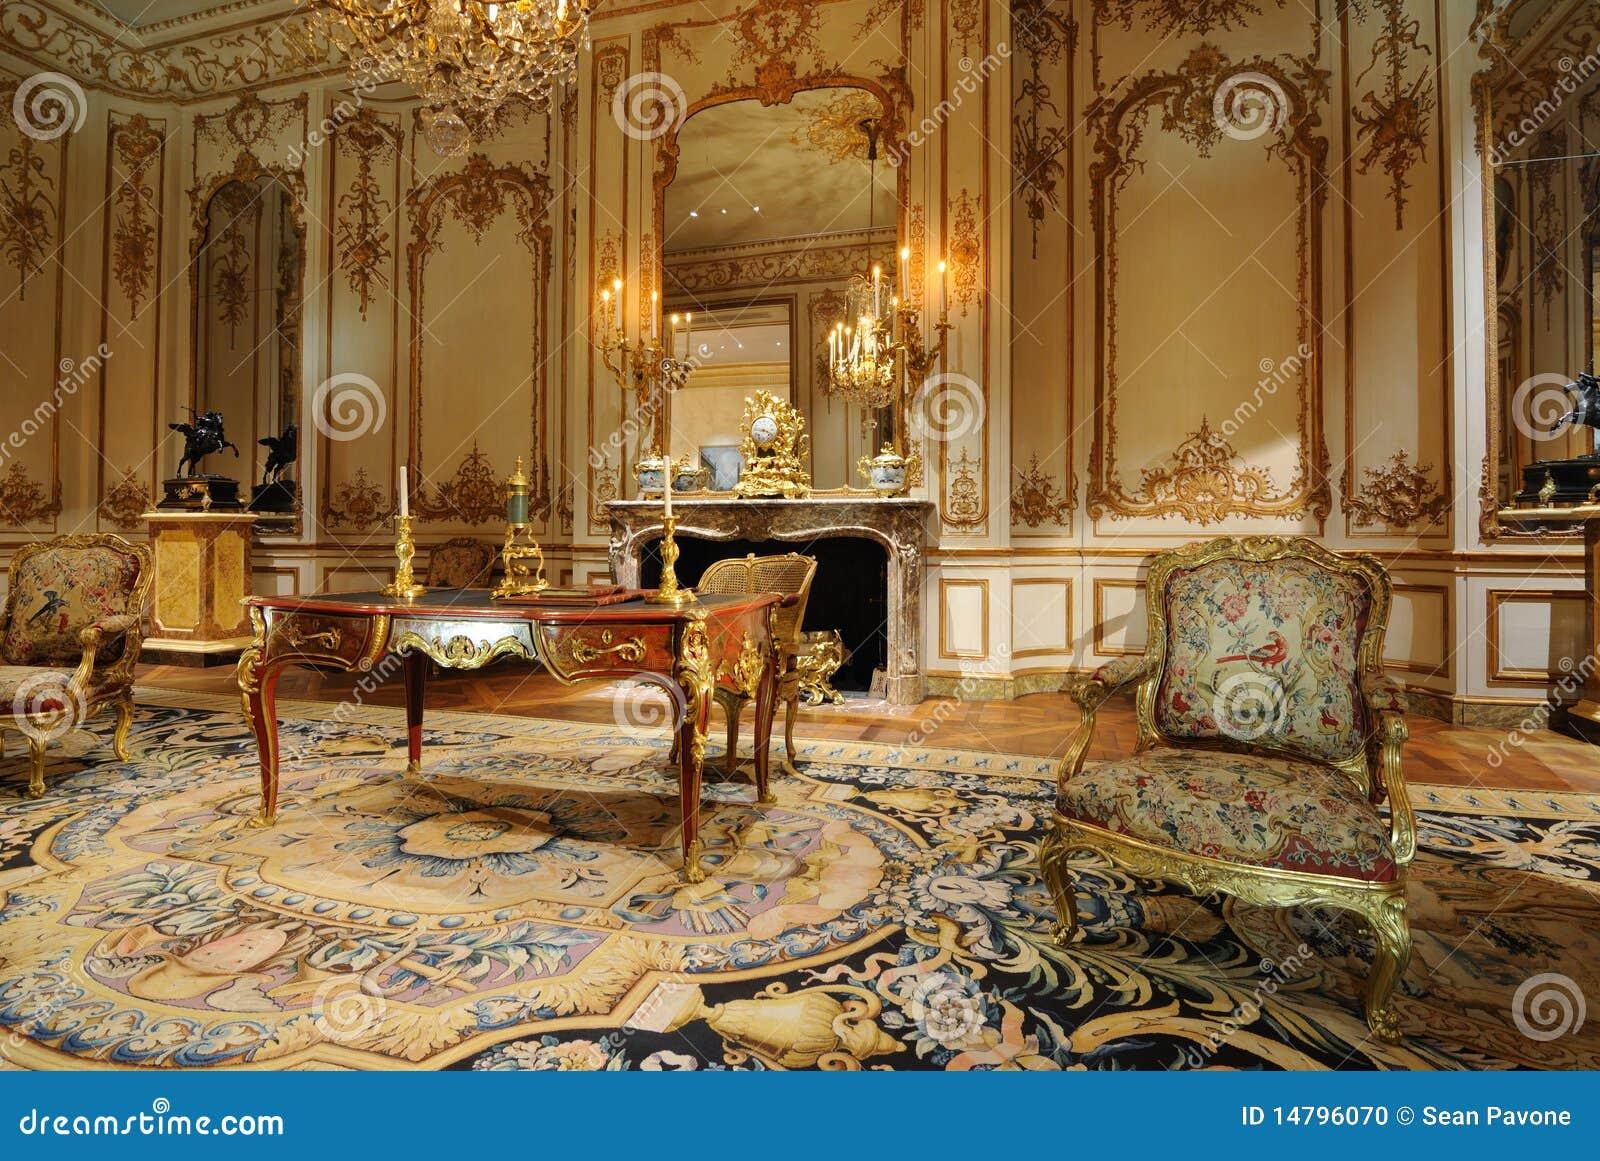 Antique Room Editorial Image Image 14796070